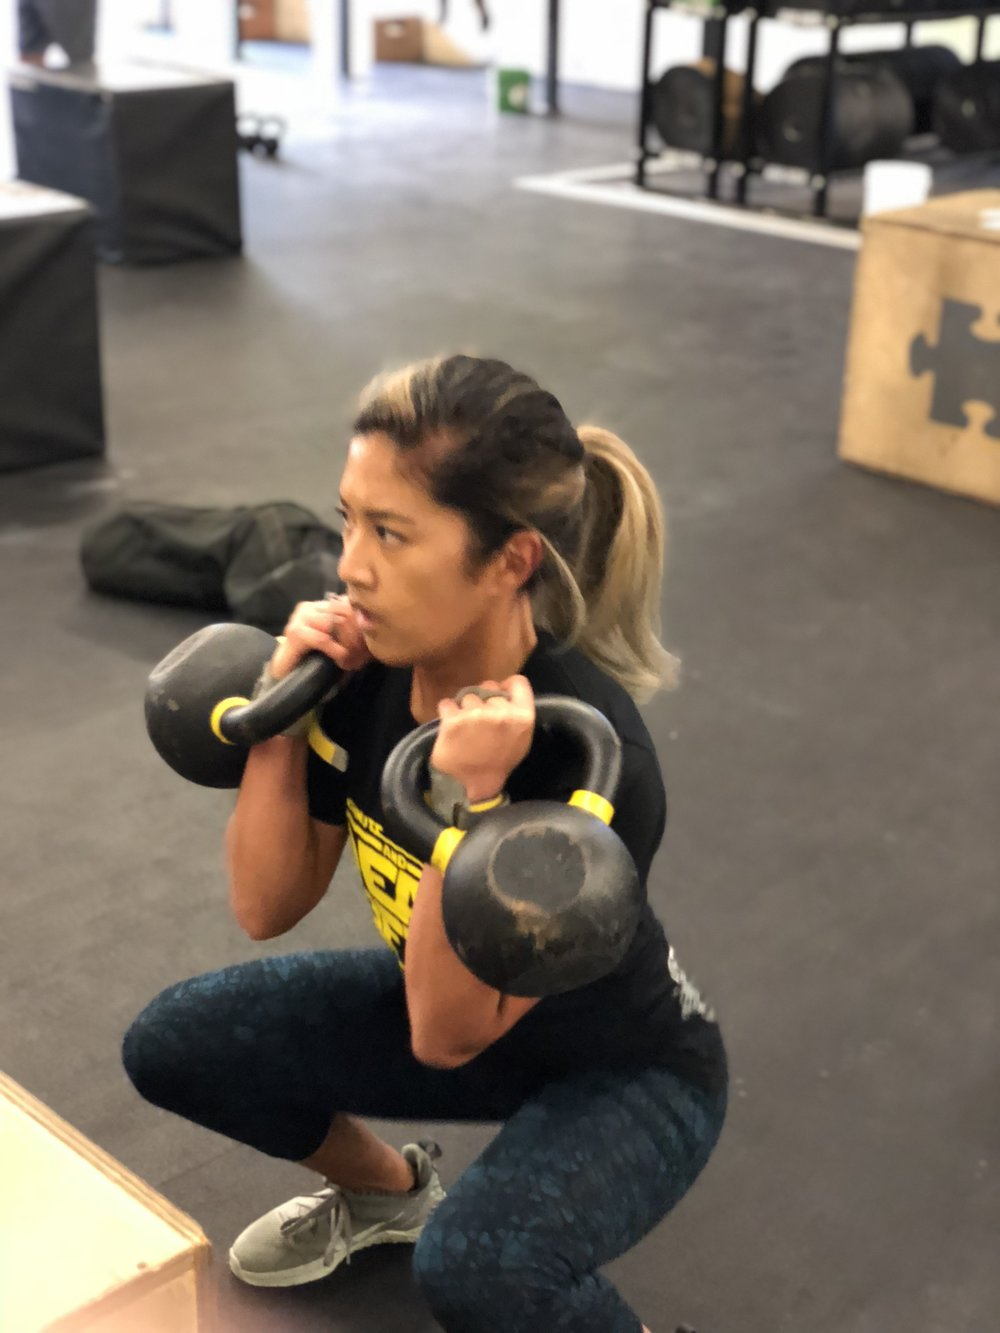 Denean making her squats look easy!